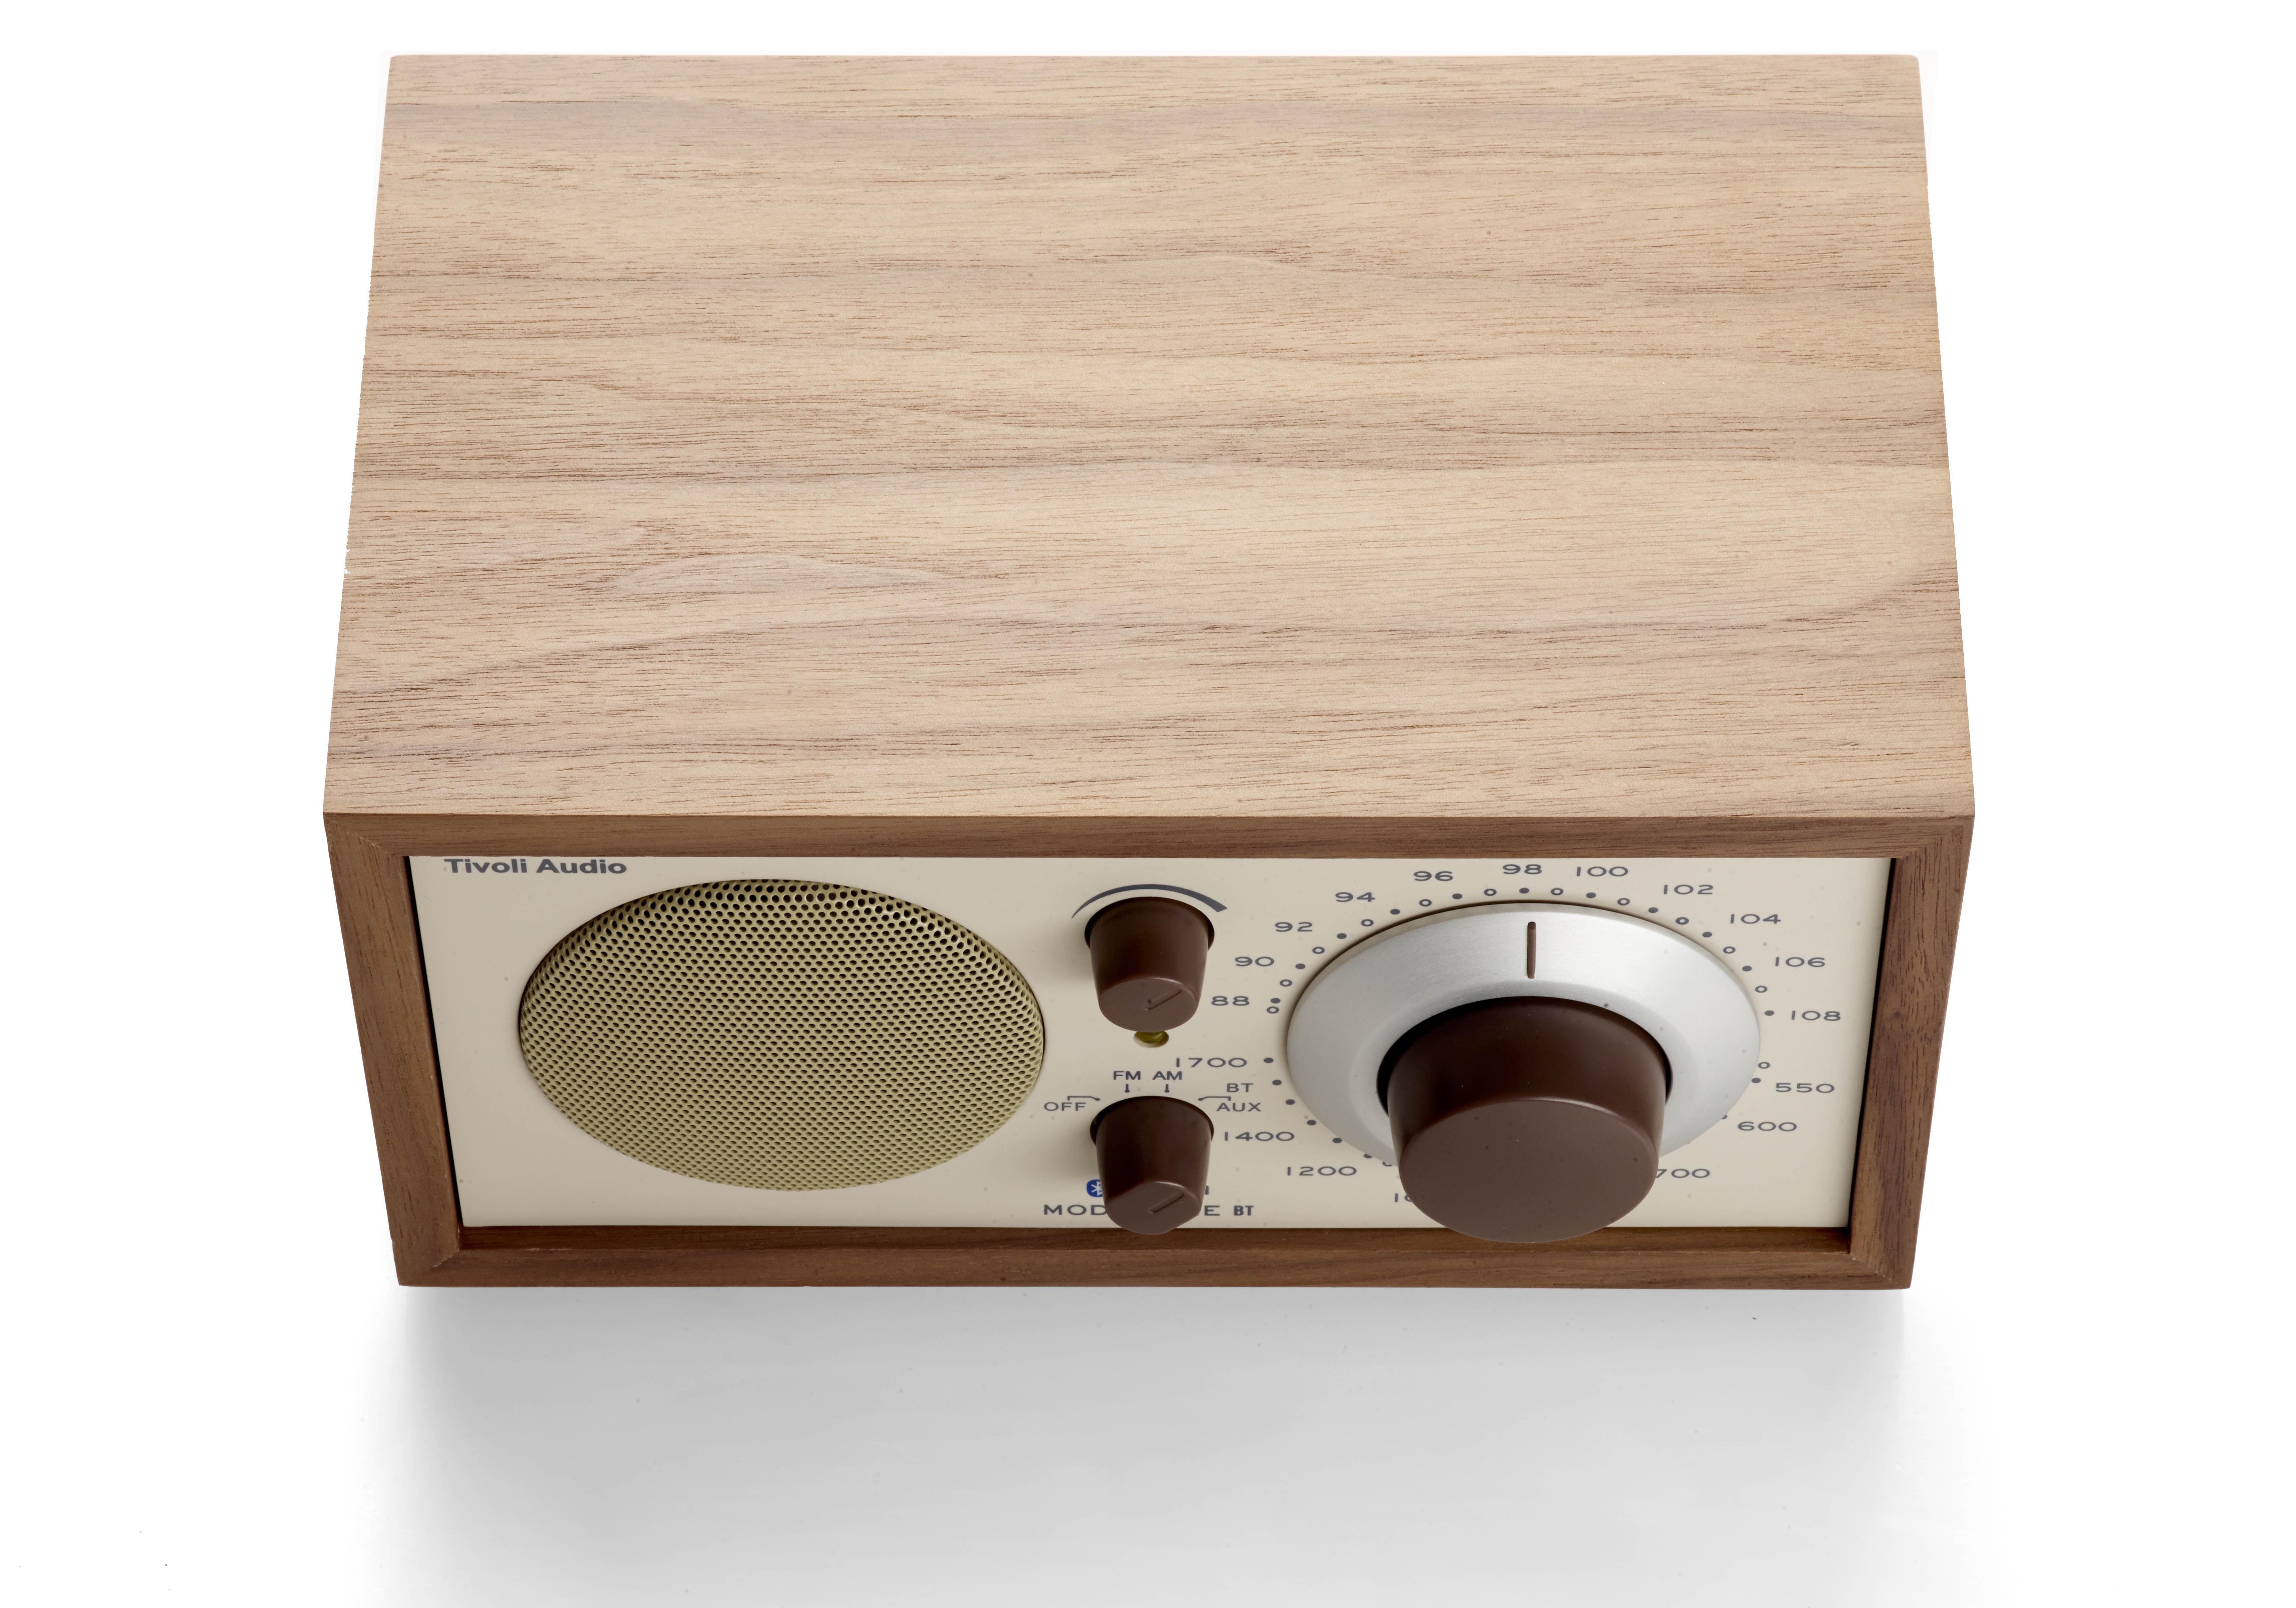 radio model one bt enceinte bluetooth noyer beige tivoli audio. Black Bedroom Furniture Sets. Home Design Ideas